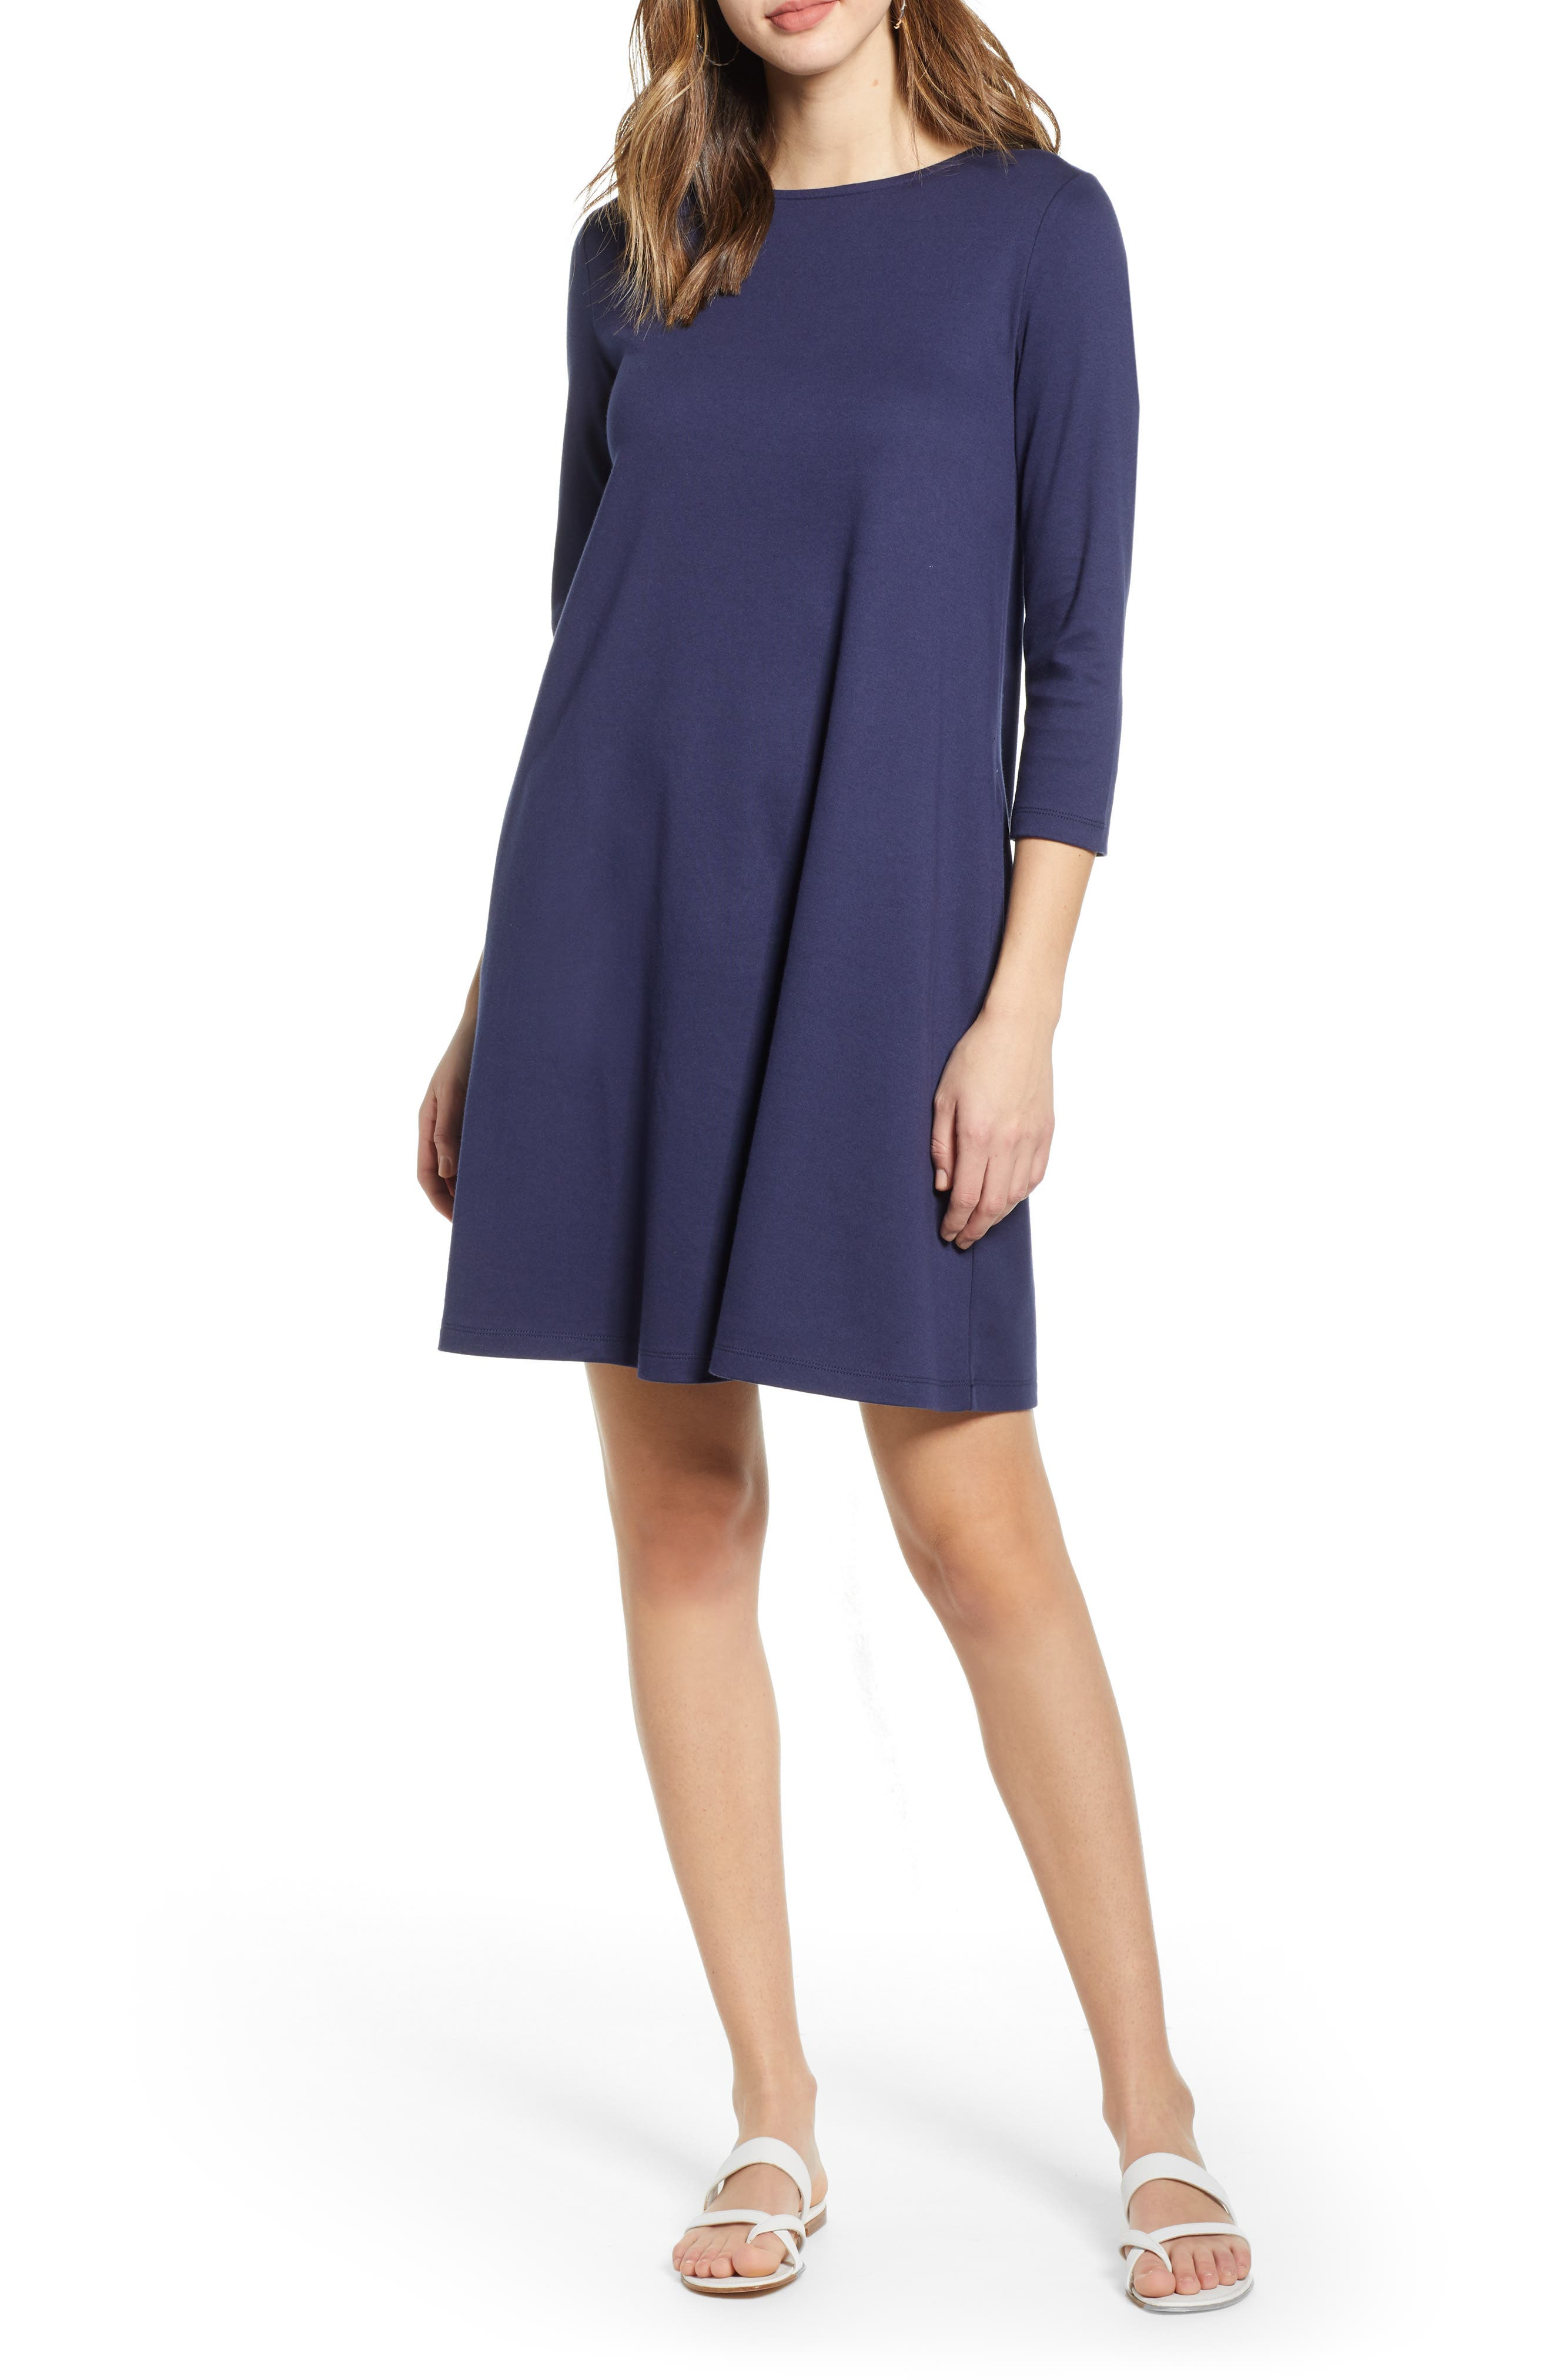 Petite 1901 Tie Back Stripe Knit Dress, Blue